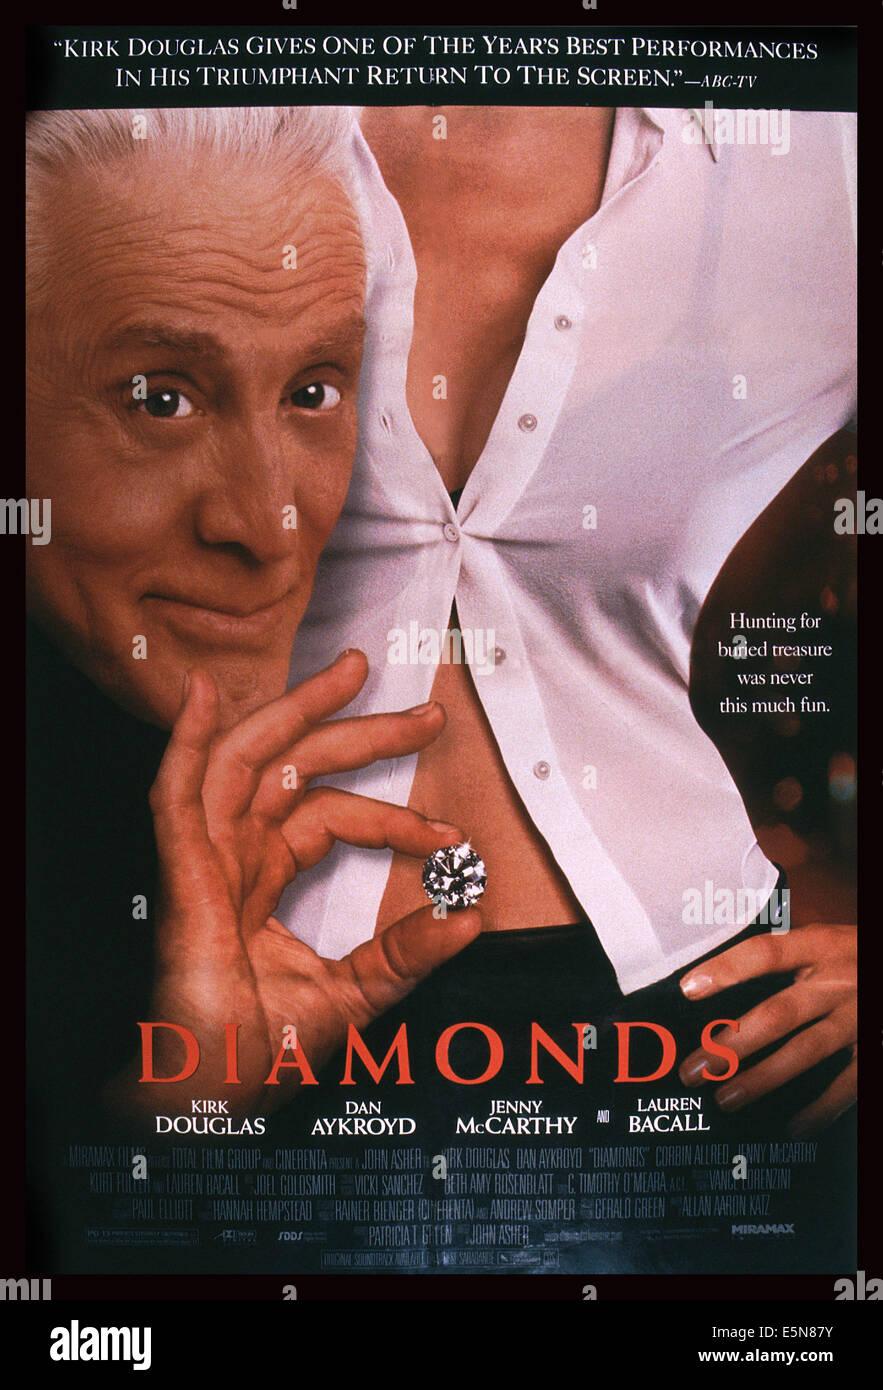 DIAMONDS, U.S. poster, Kirk Douglas, 1999. ©Miramax/Courtesy Everett Collection Stock Photo